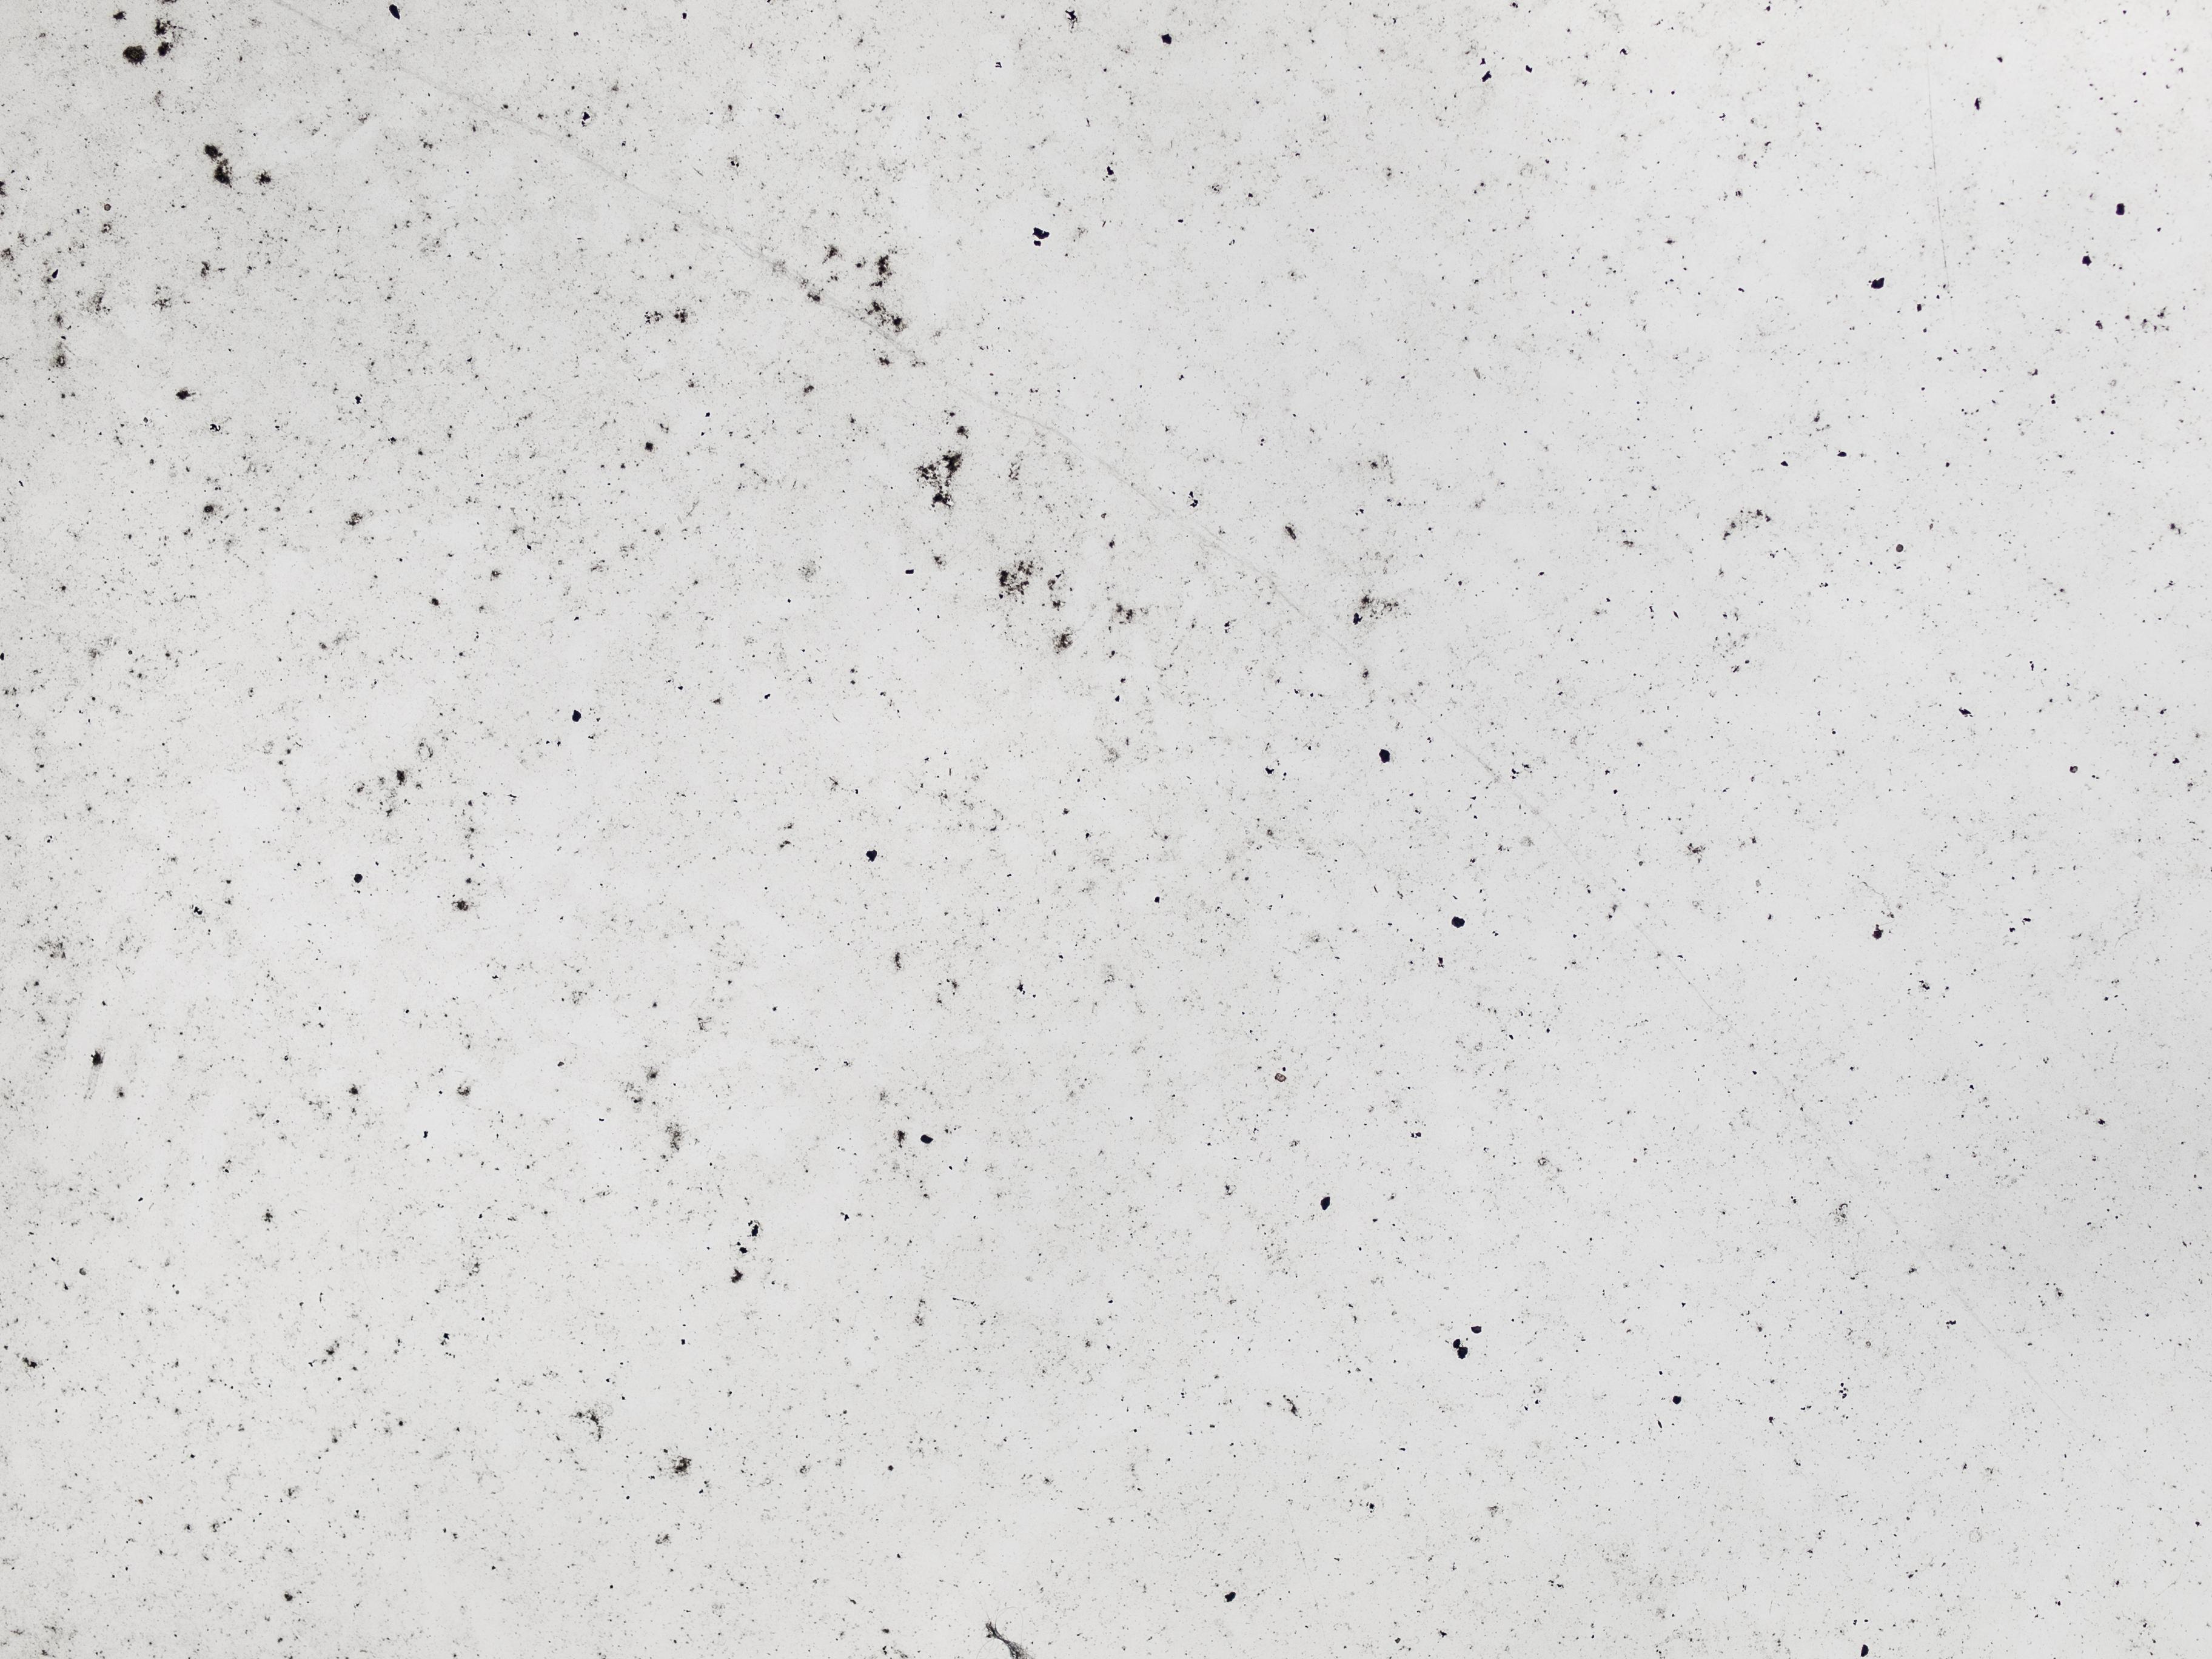 18 Polished Concrete Flooring Texture | euglena.biz